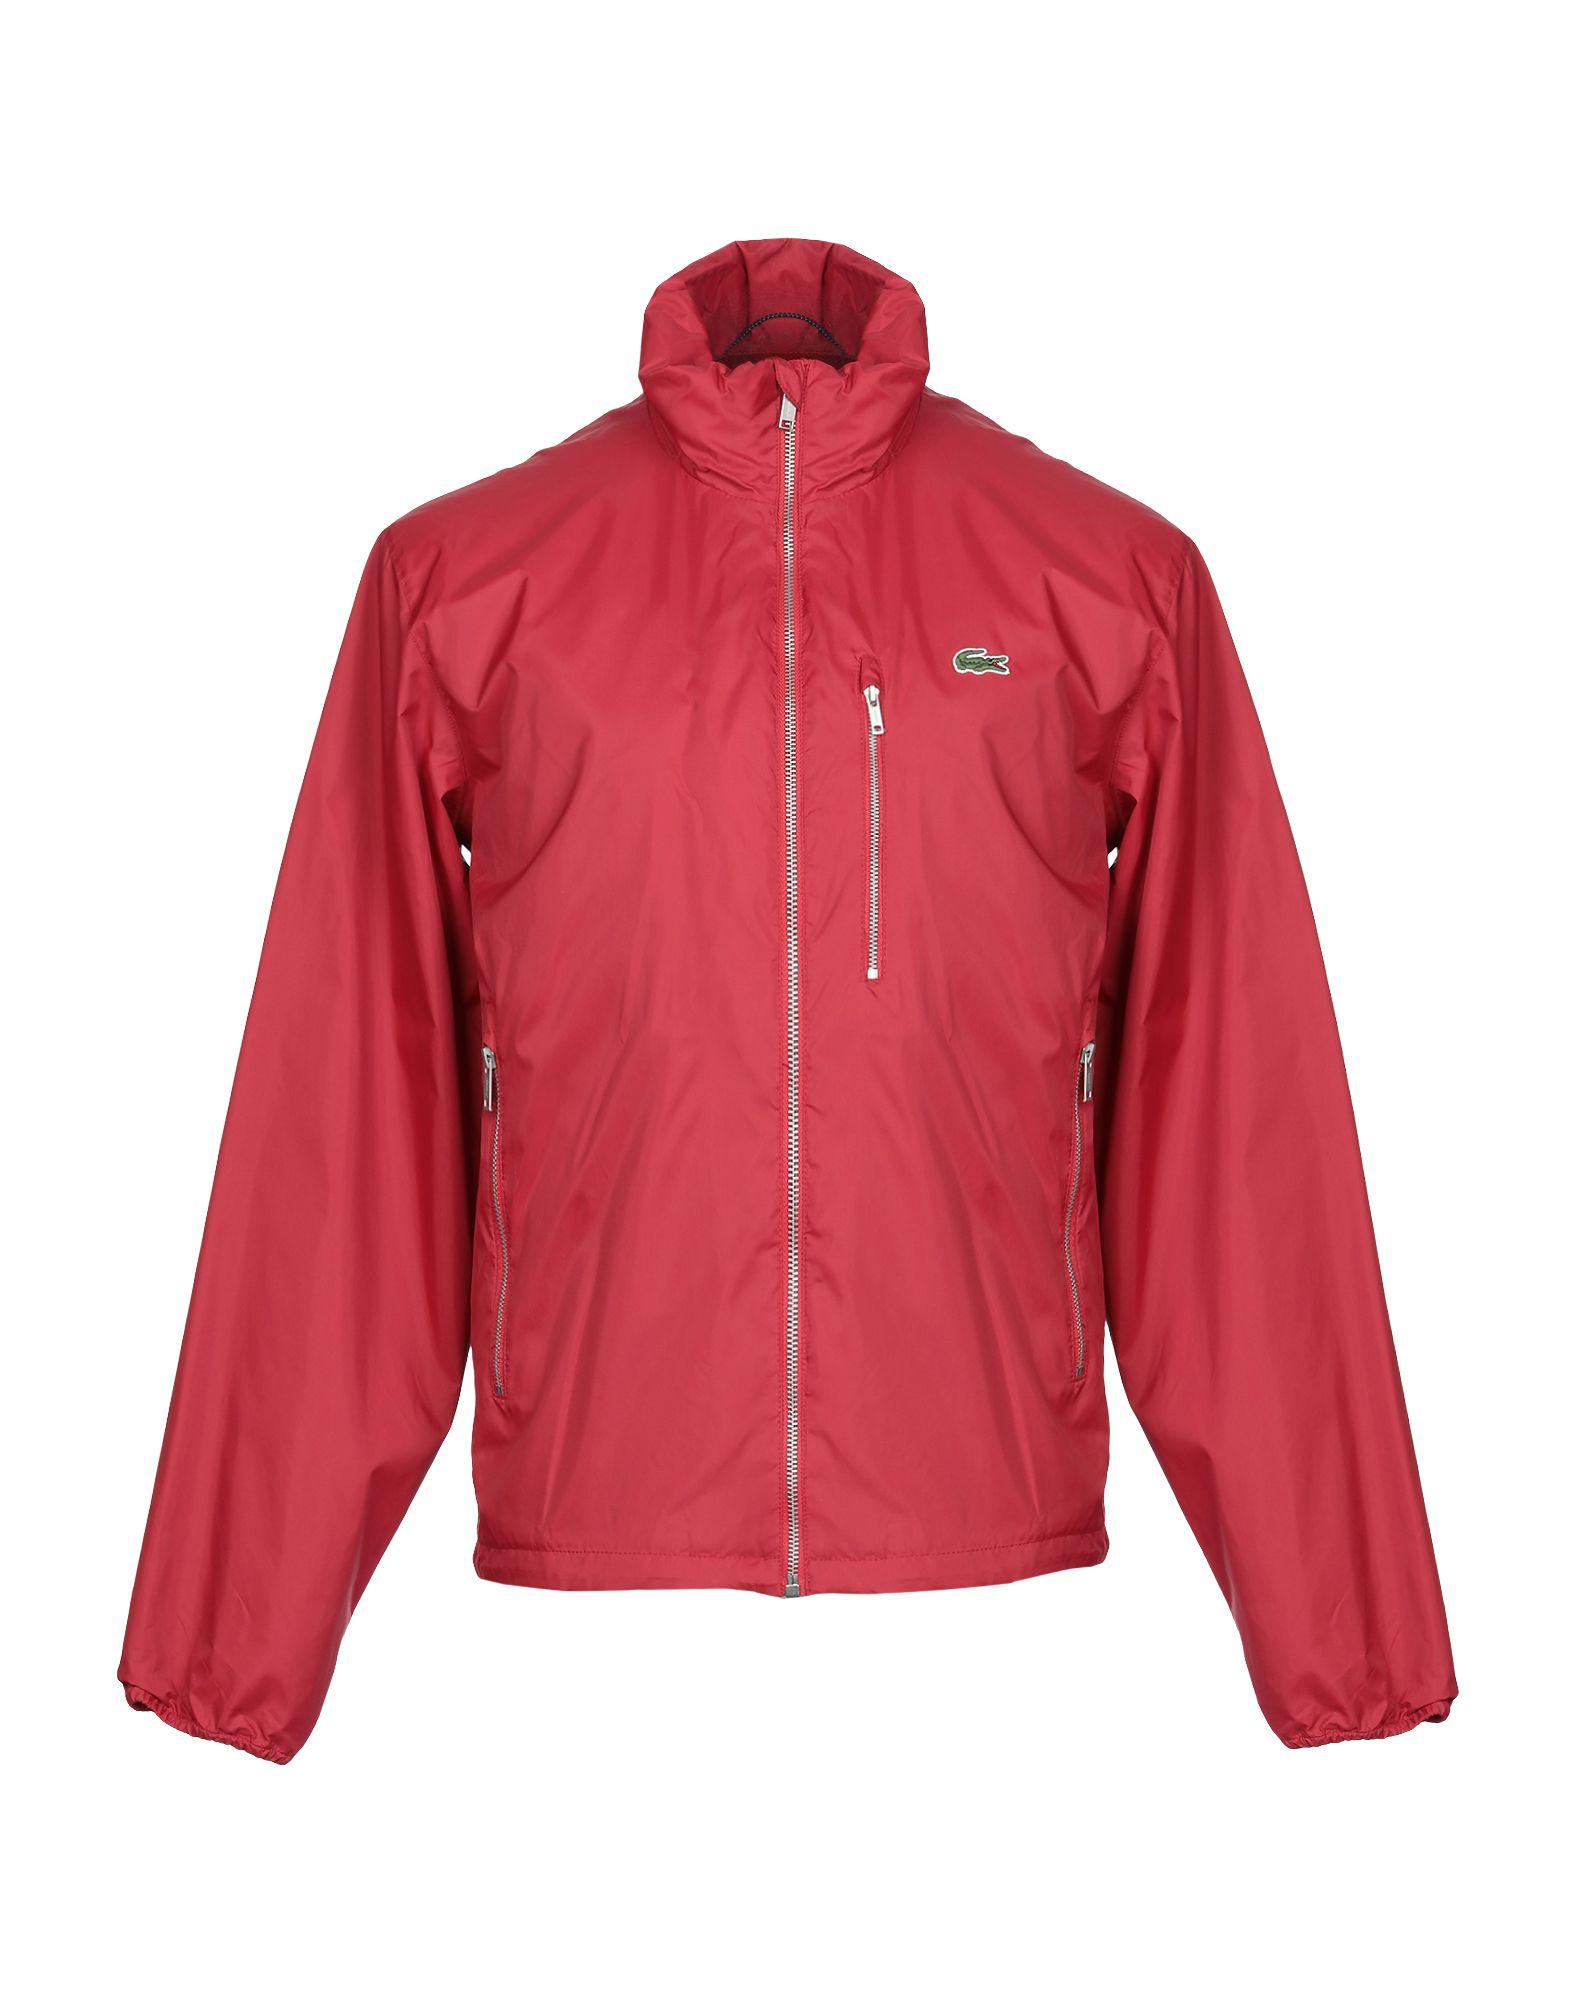 dcbdec5e8 LACOSTE Jacket - Coats & Jackets   YOOX.COM